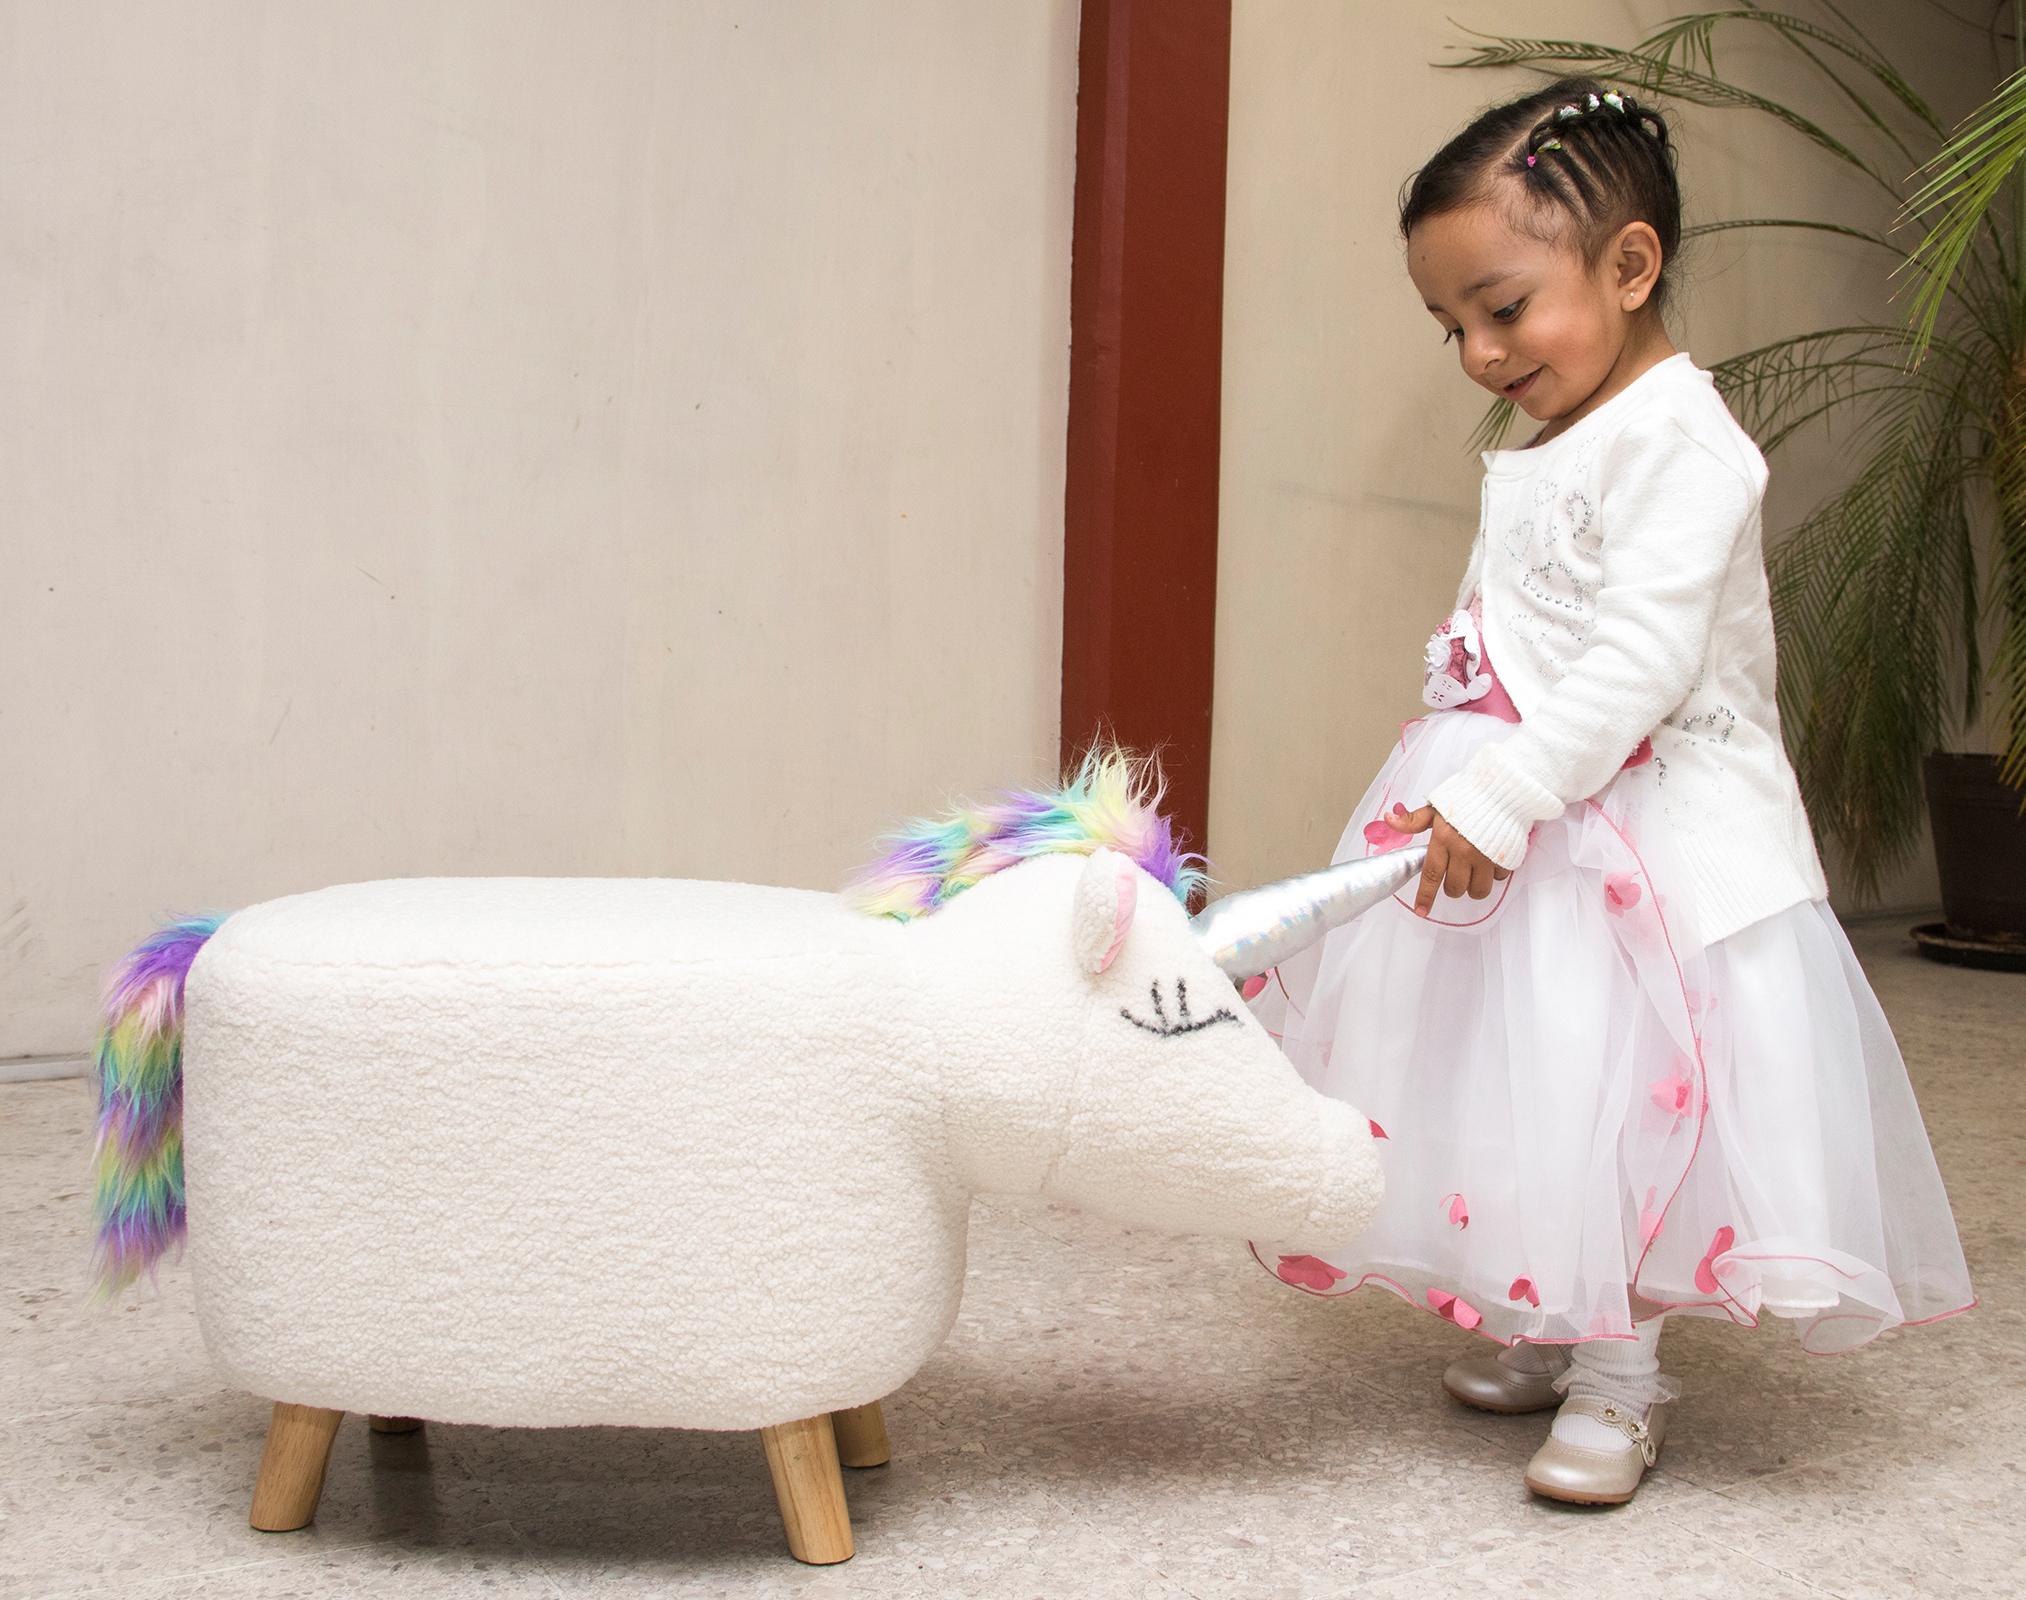 smile-train-little-girl-with-unicorn-stool.jpg